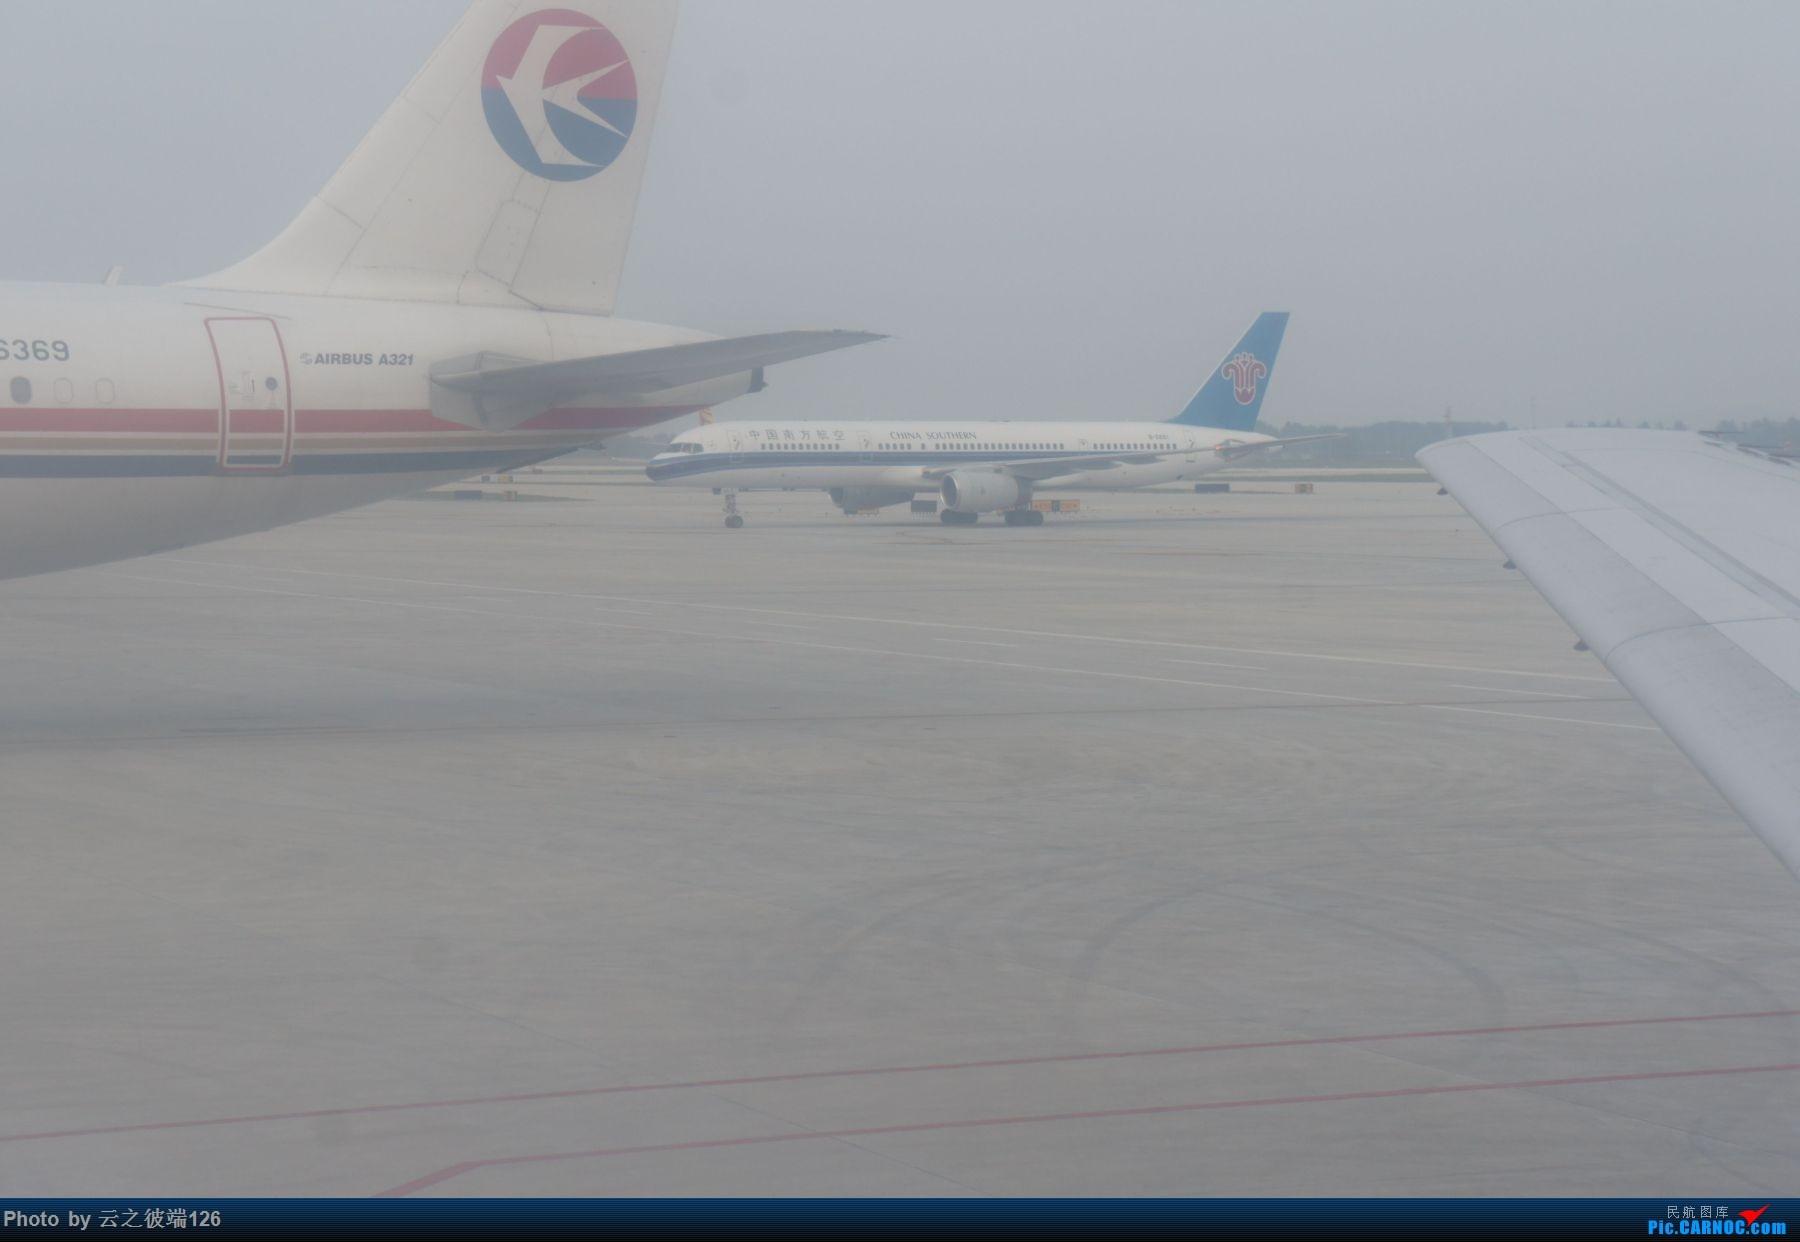 Re:[原创]迟到两年的游记 -----------NKG-SZX-NKG ZH+白菜航------ BOEING 757-200 B-2851 中国南京禄口国际机场